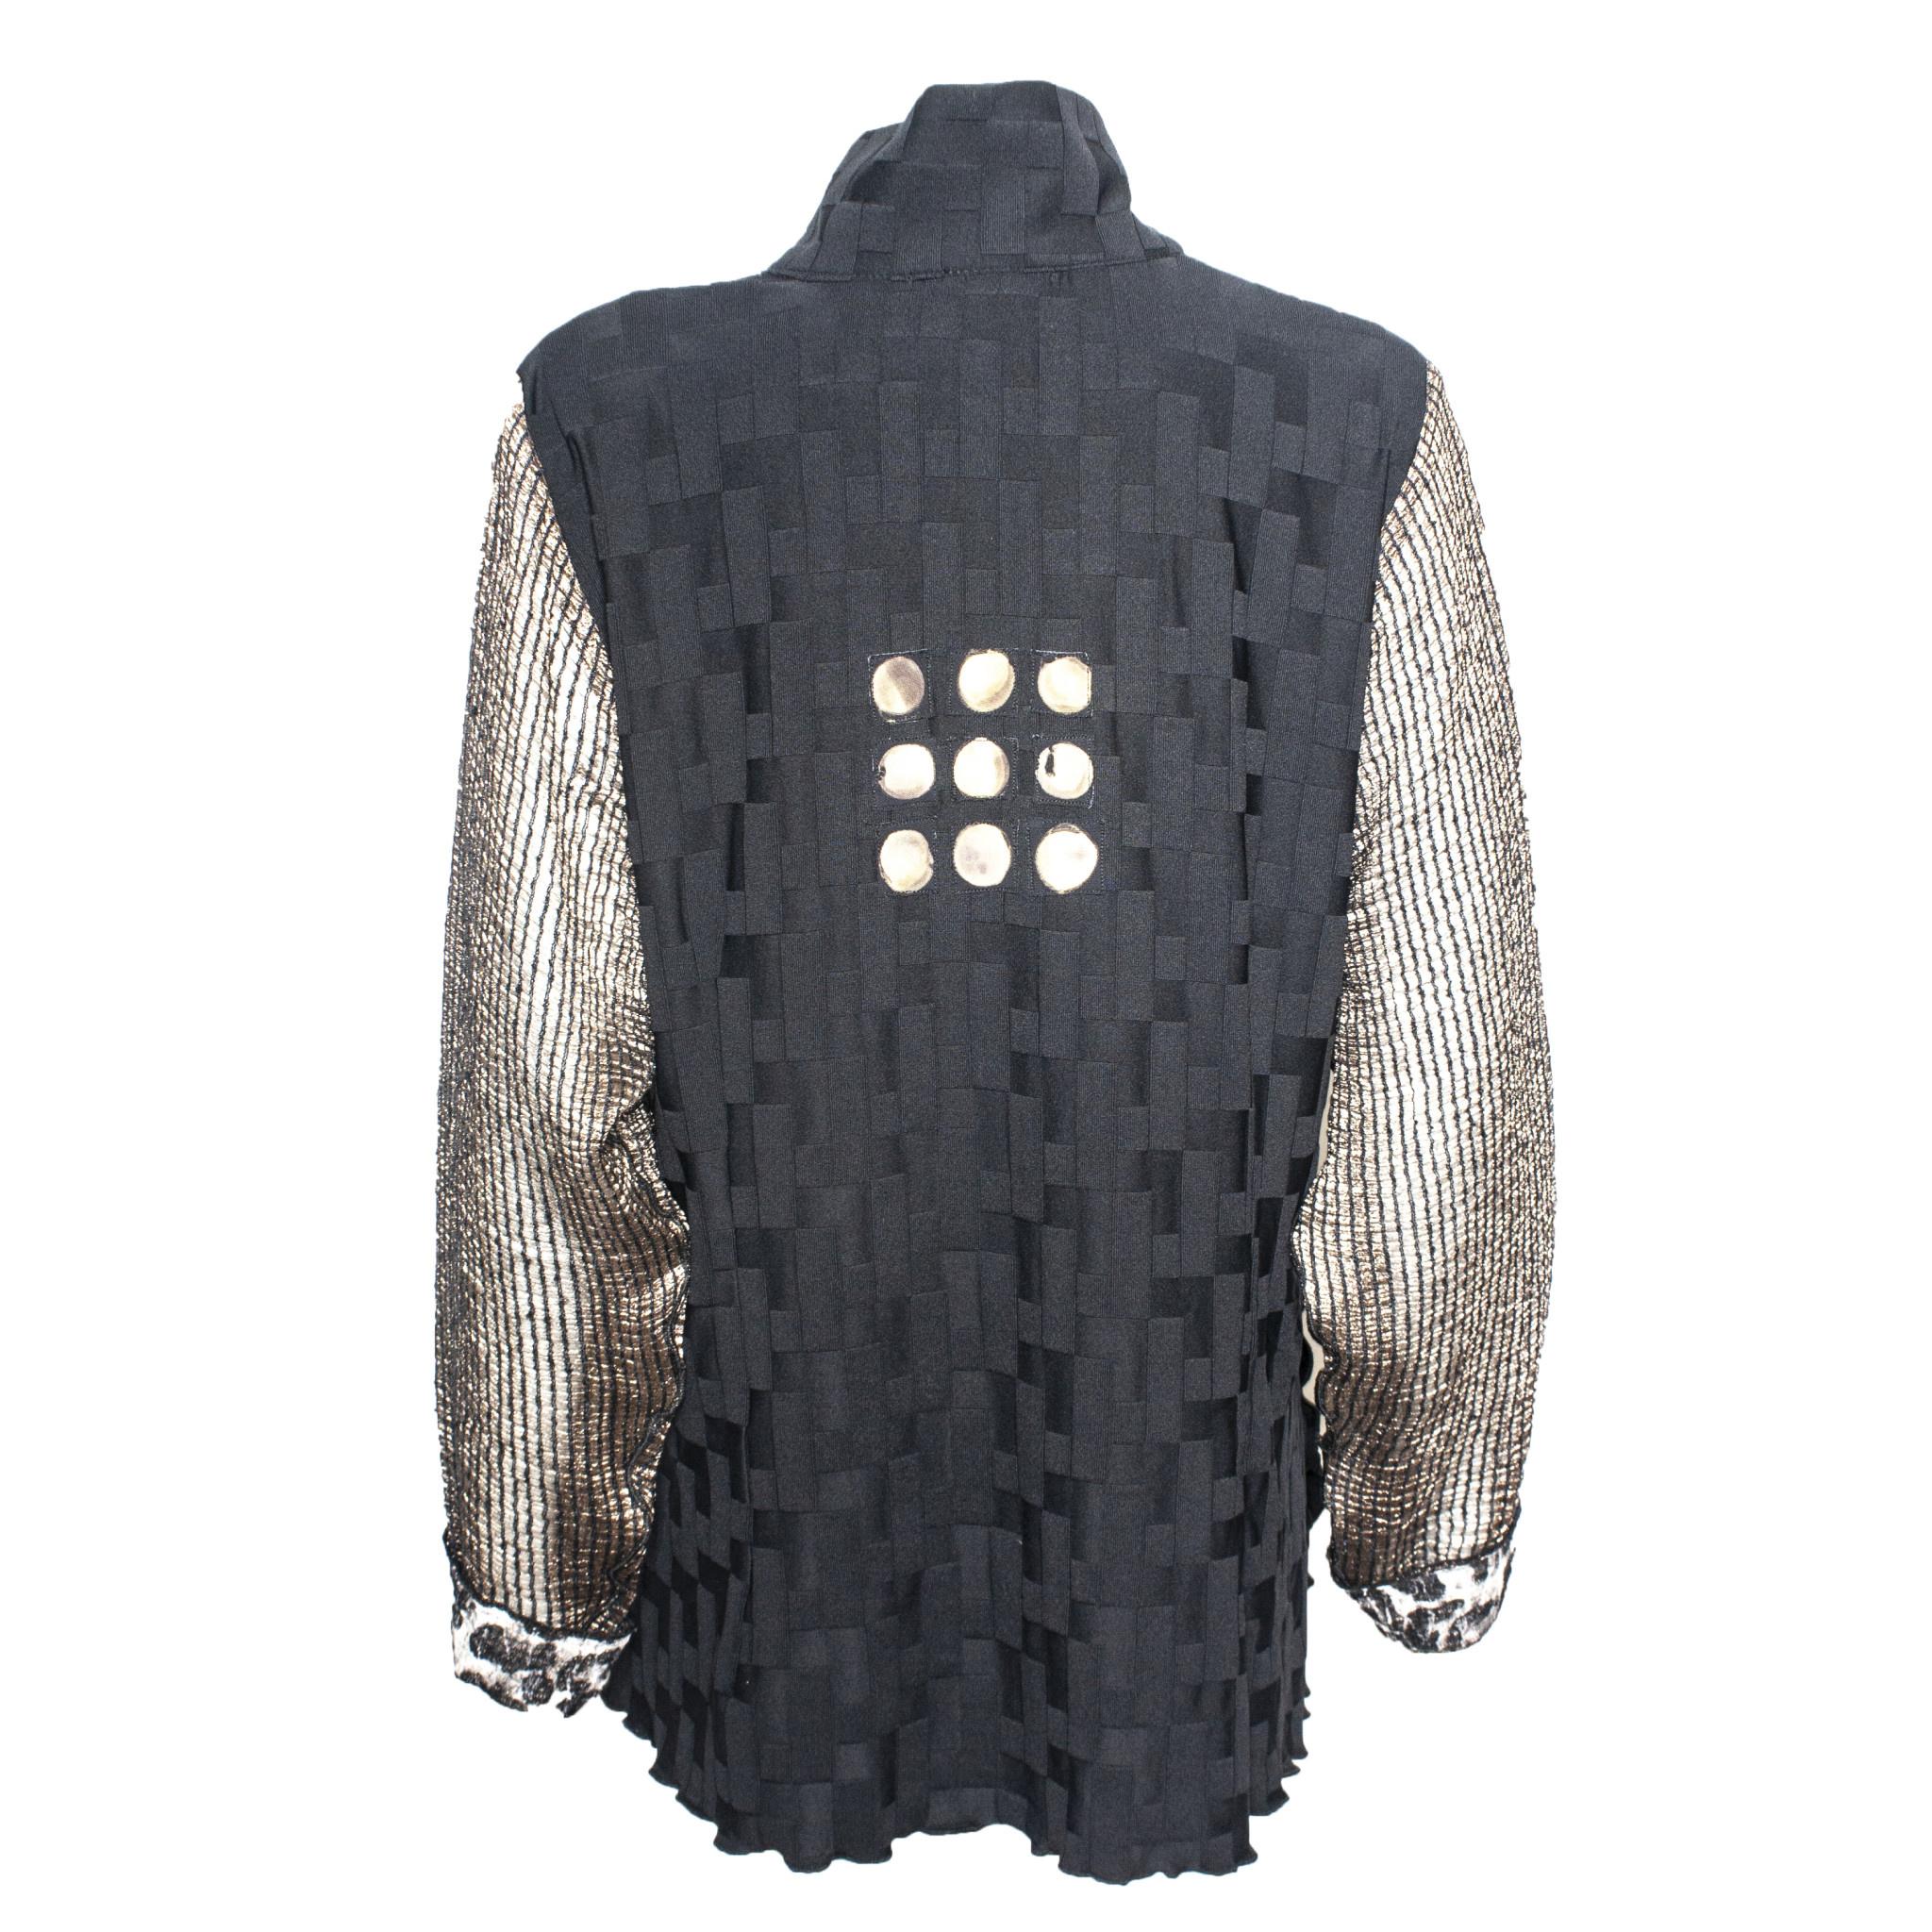 Deborah Cross Deborah Cross Sheer Sleeve Shirt - Black